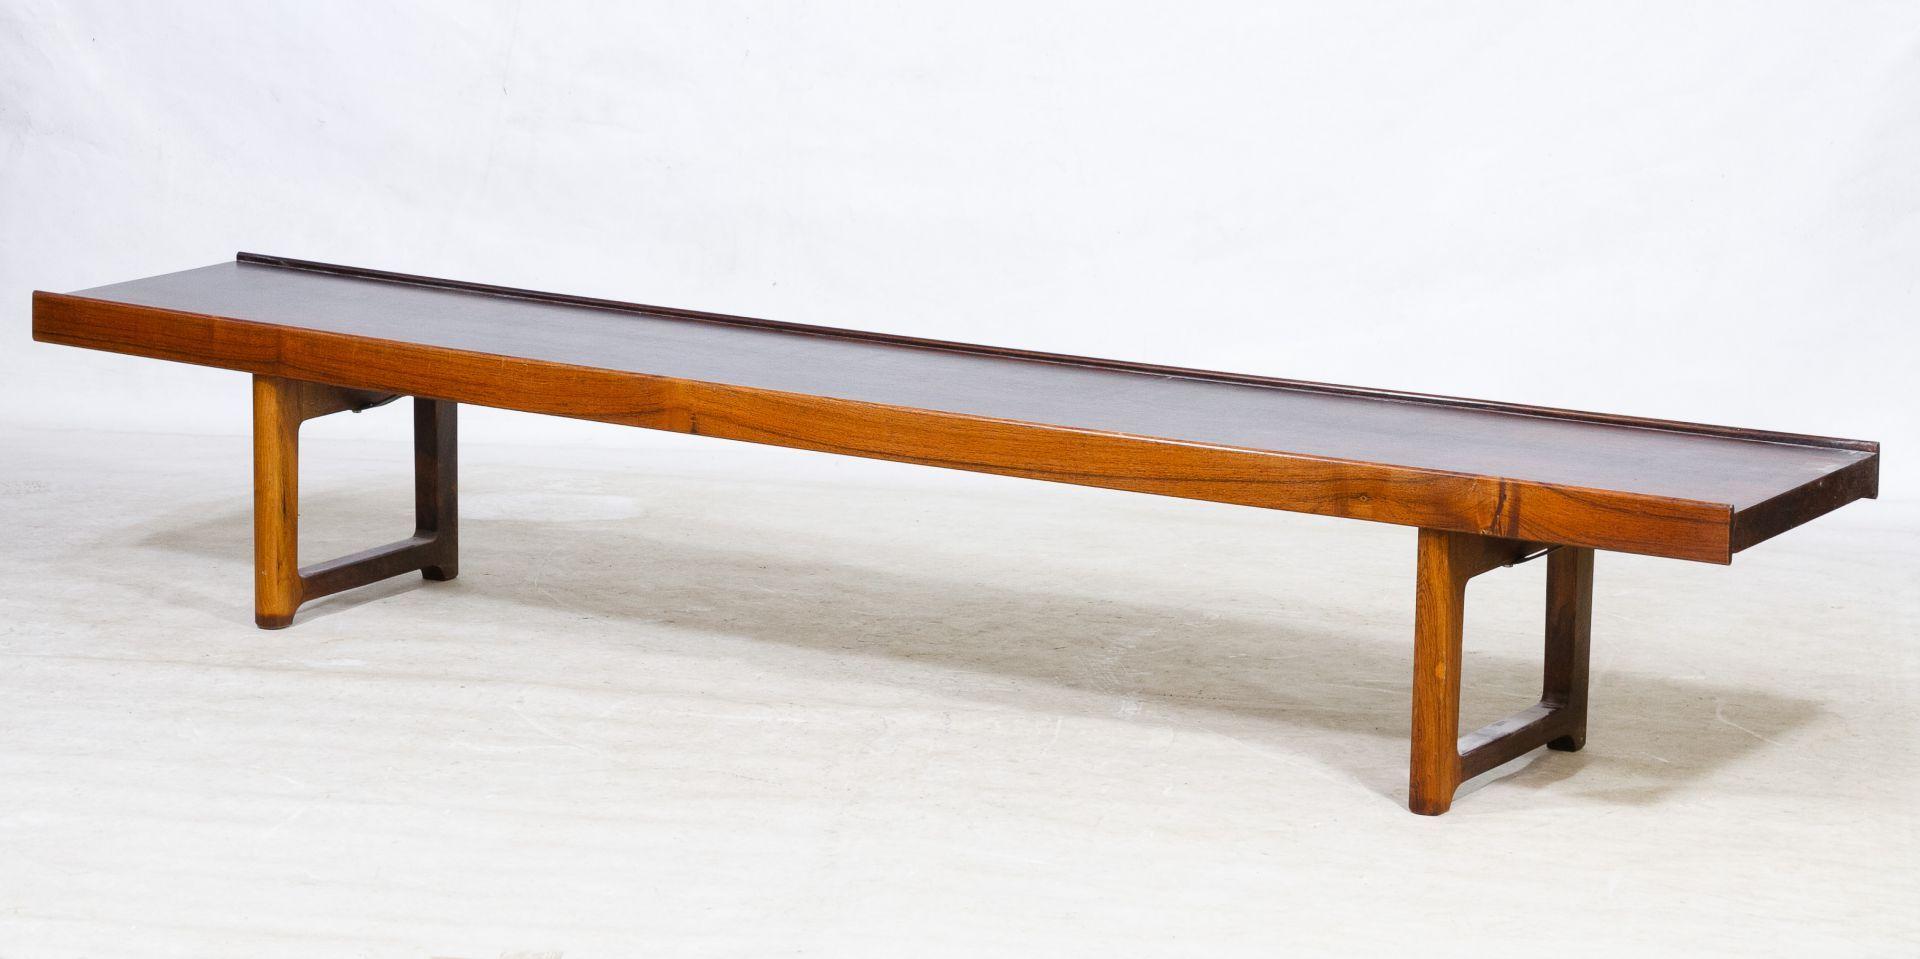 Mid Century Modern Slat Bench Coffee Table Danish Modern Extendable Slat Bench Mid Century Coffee Table Mid Century Modern Furniture Mid Century Modern Decor